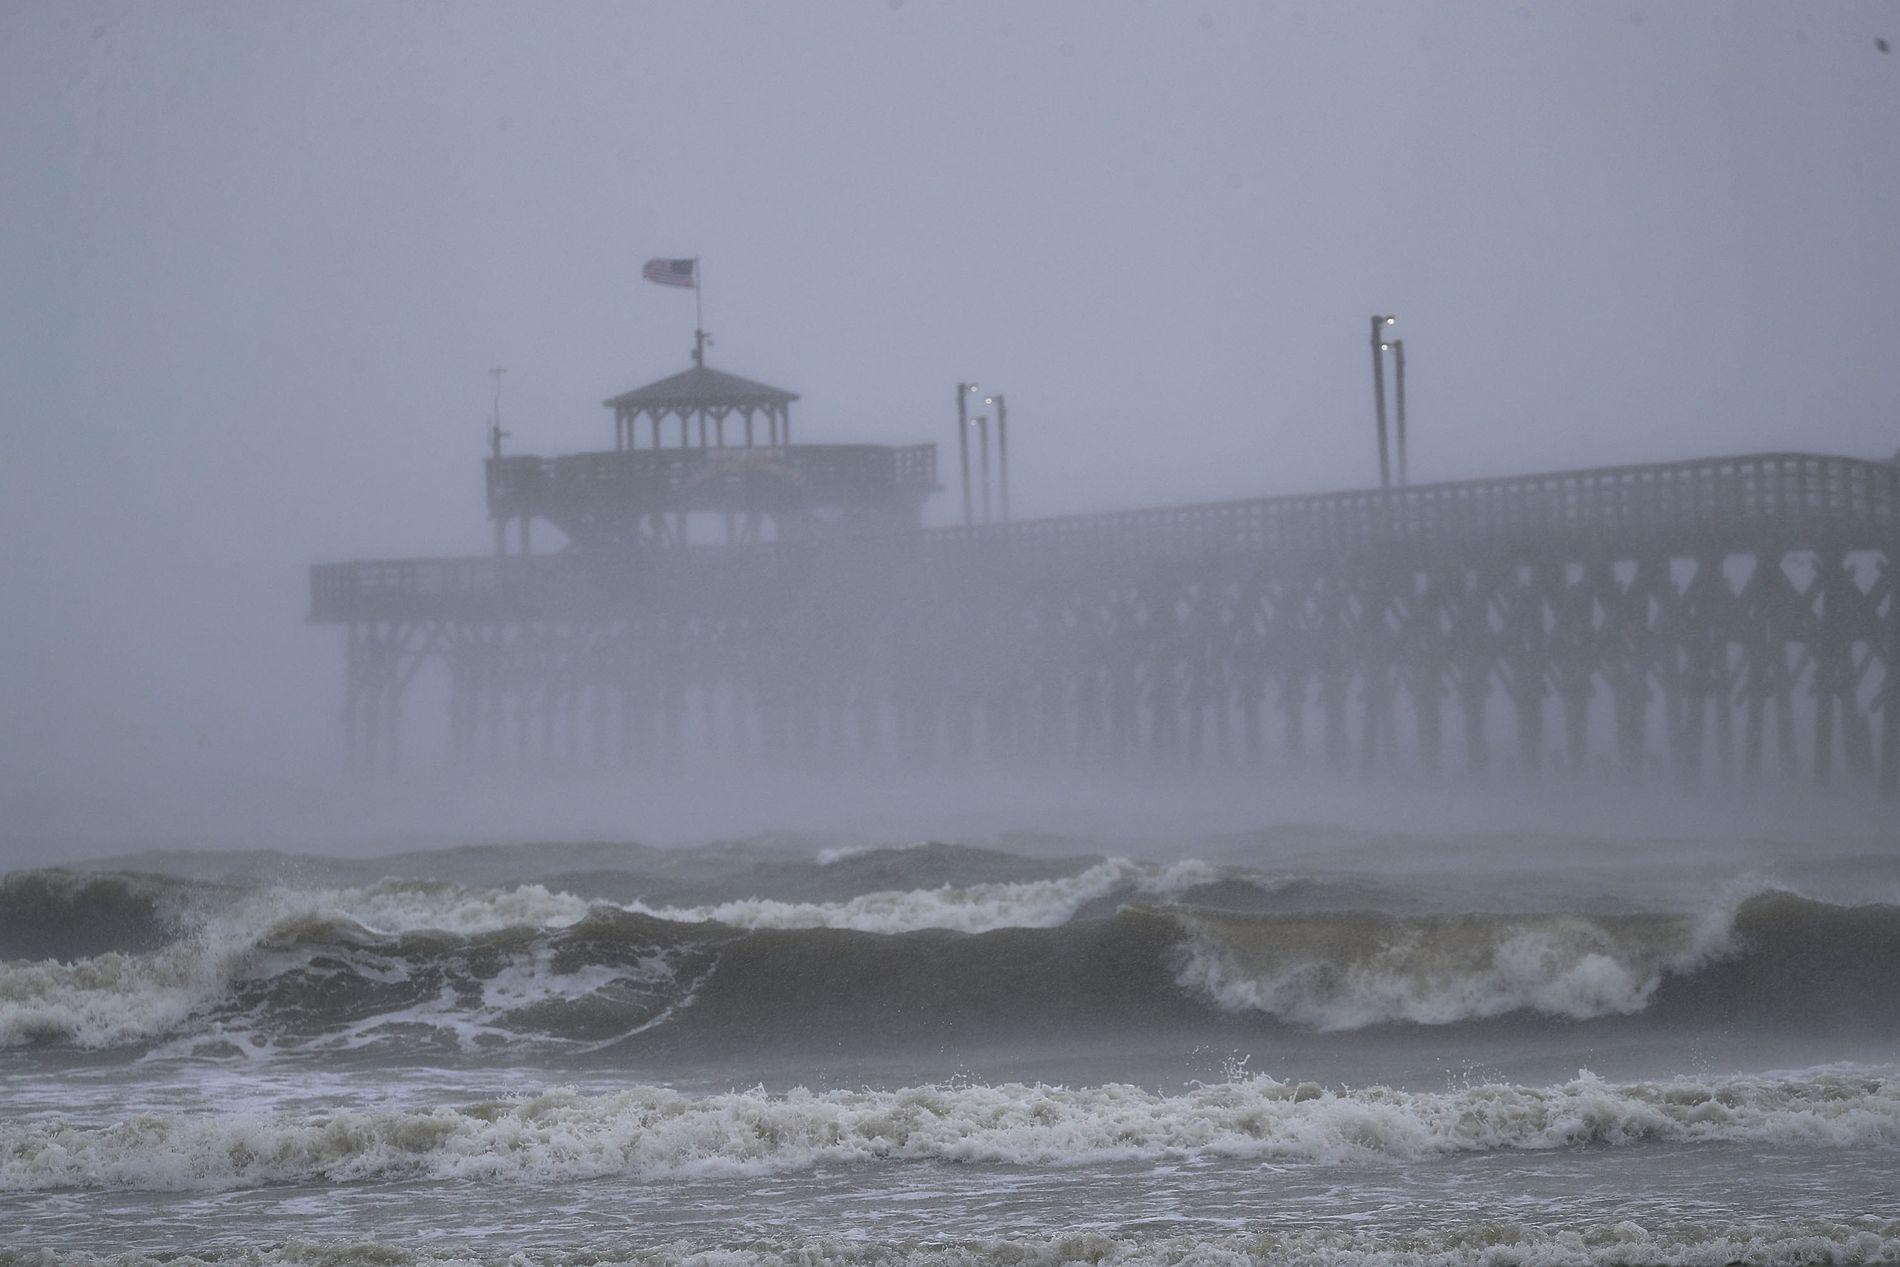 IGJEN: Amerikanerne forbereder seg på nok en orkan, knapt en måned etter orkanen «Florence» herjet.